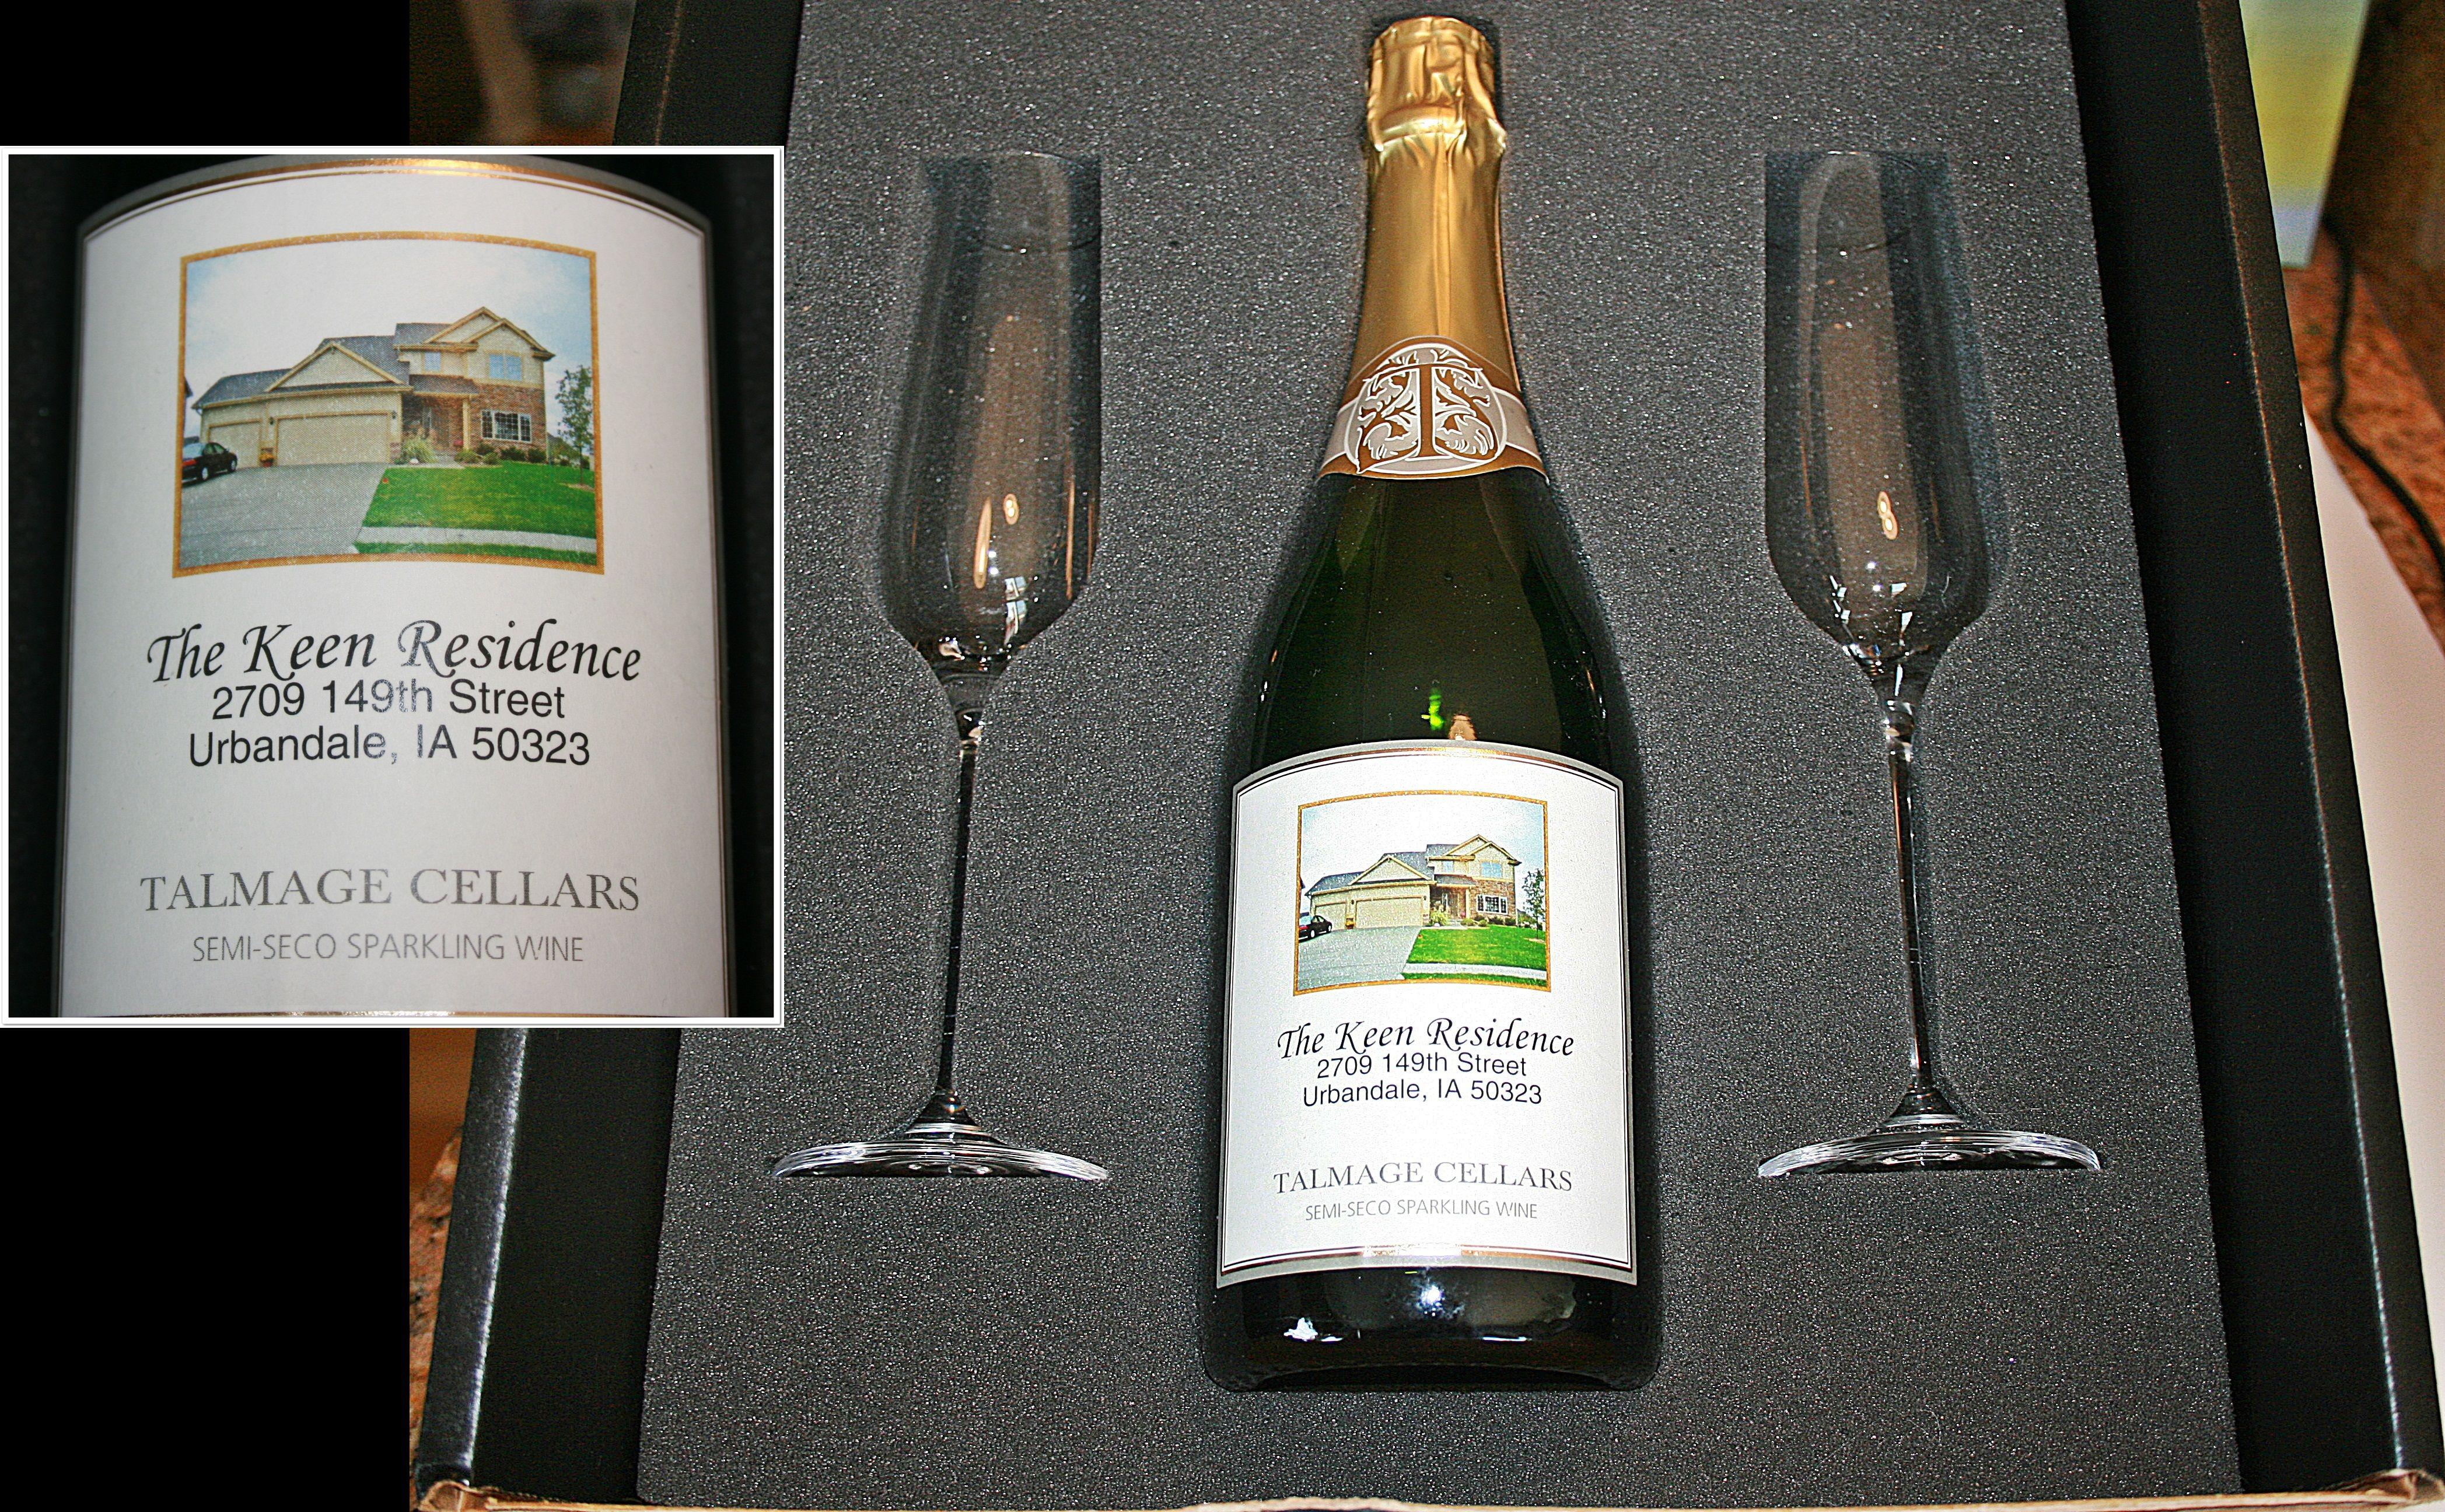 Housewarming wine also great idea for realtors or lenders